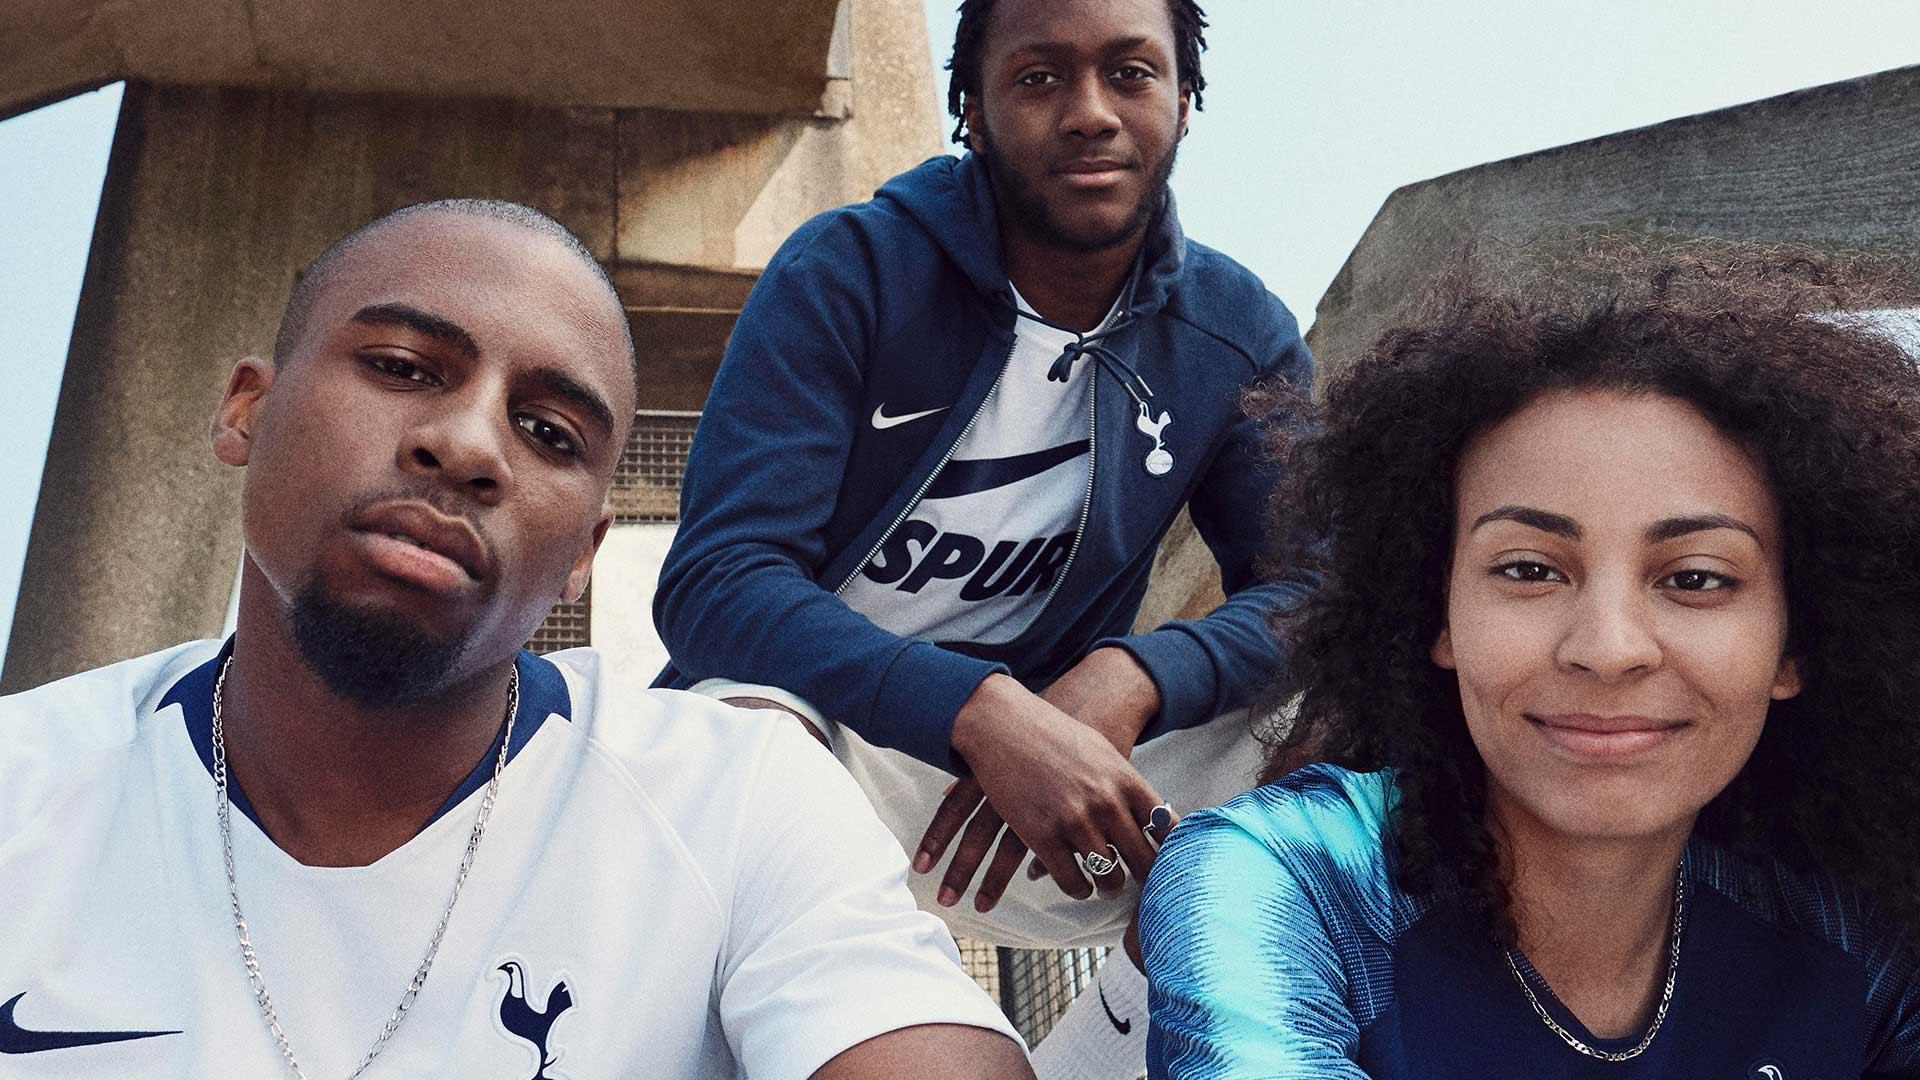 138792144d9 2018/19 Tottenham Hotspur Stadium Home Kit. Nike.com GB